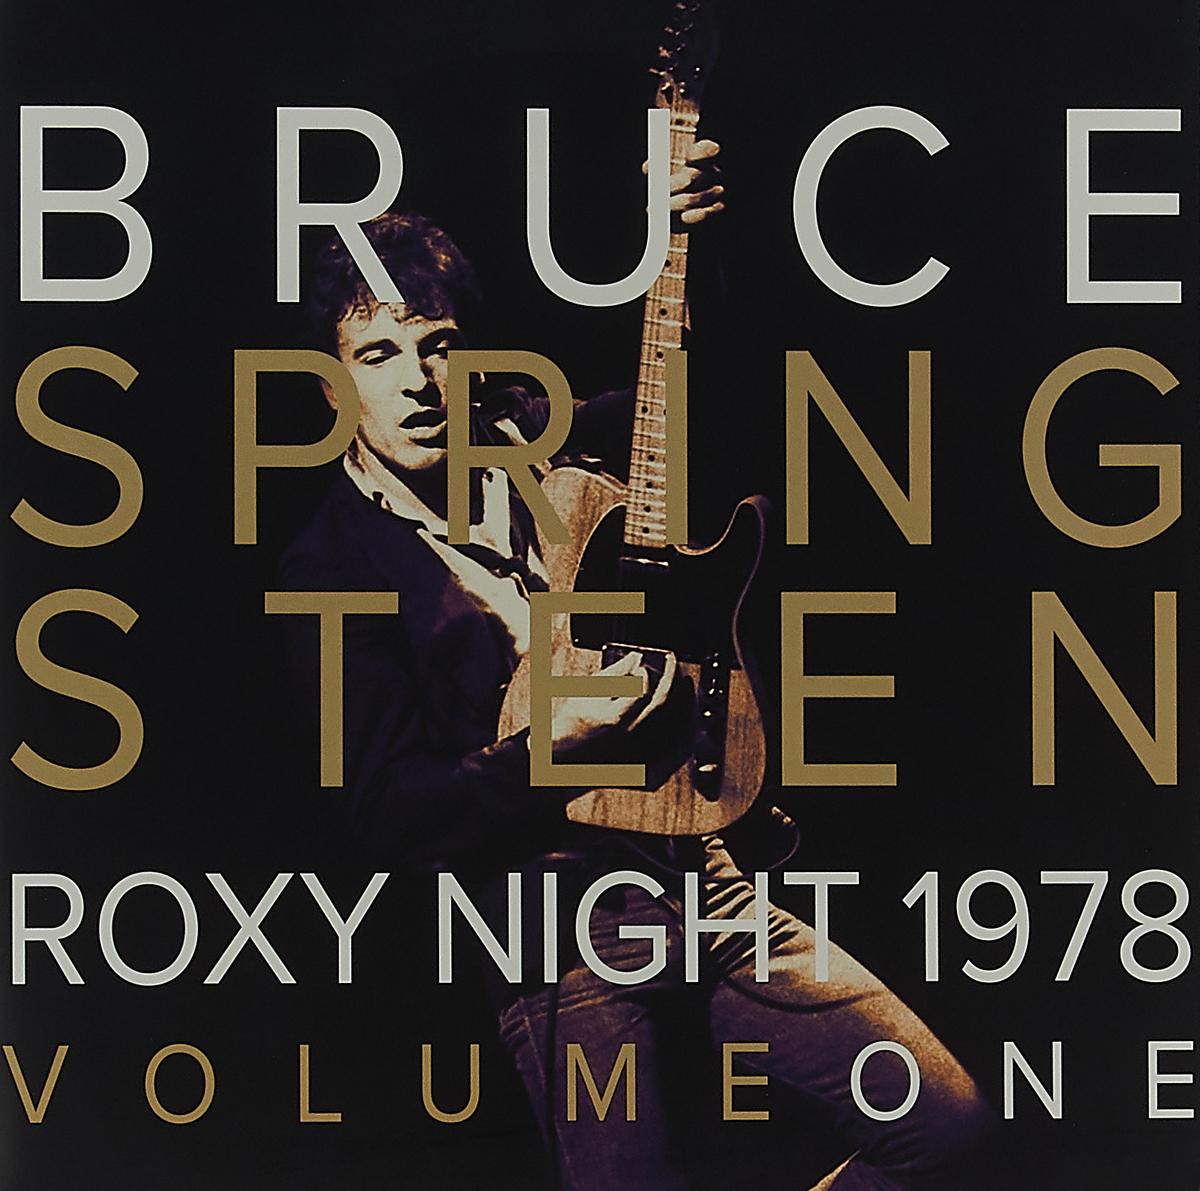 Брюс Спрингстин Bruce Springsteen. 1978 Roxy Night Vol.1 (2 LP) брюс спрингстин bruce springsteen passaic night 1978 the classic new jersey broadcast volume two 2 lp